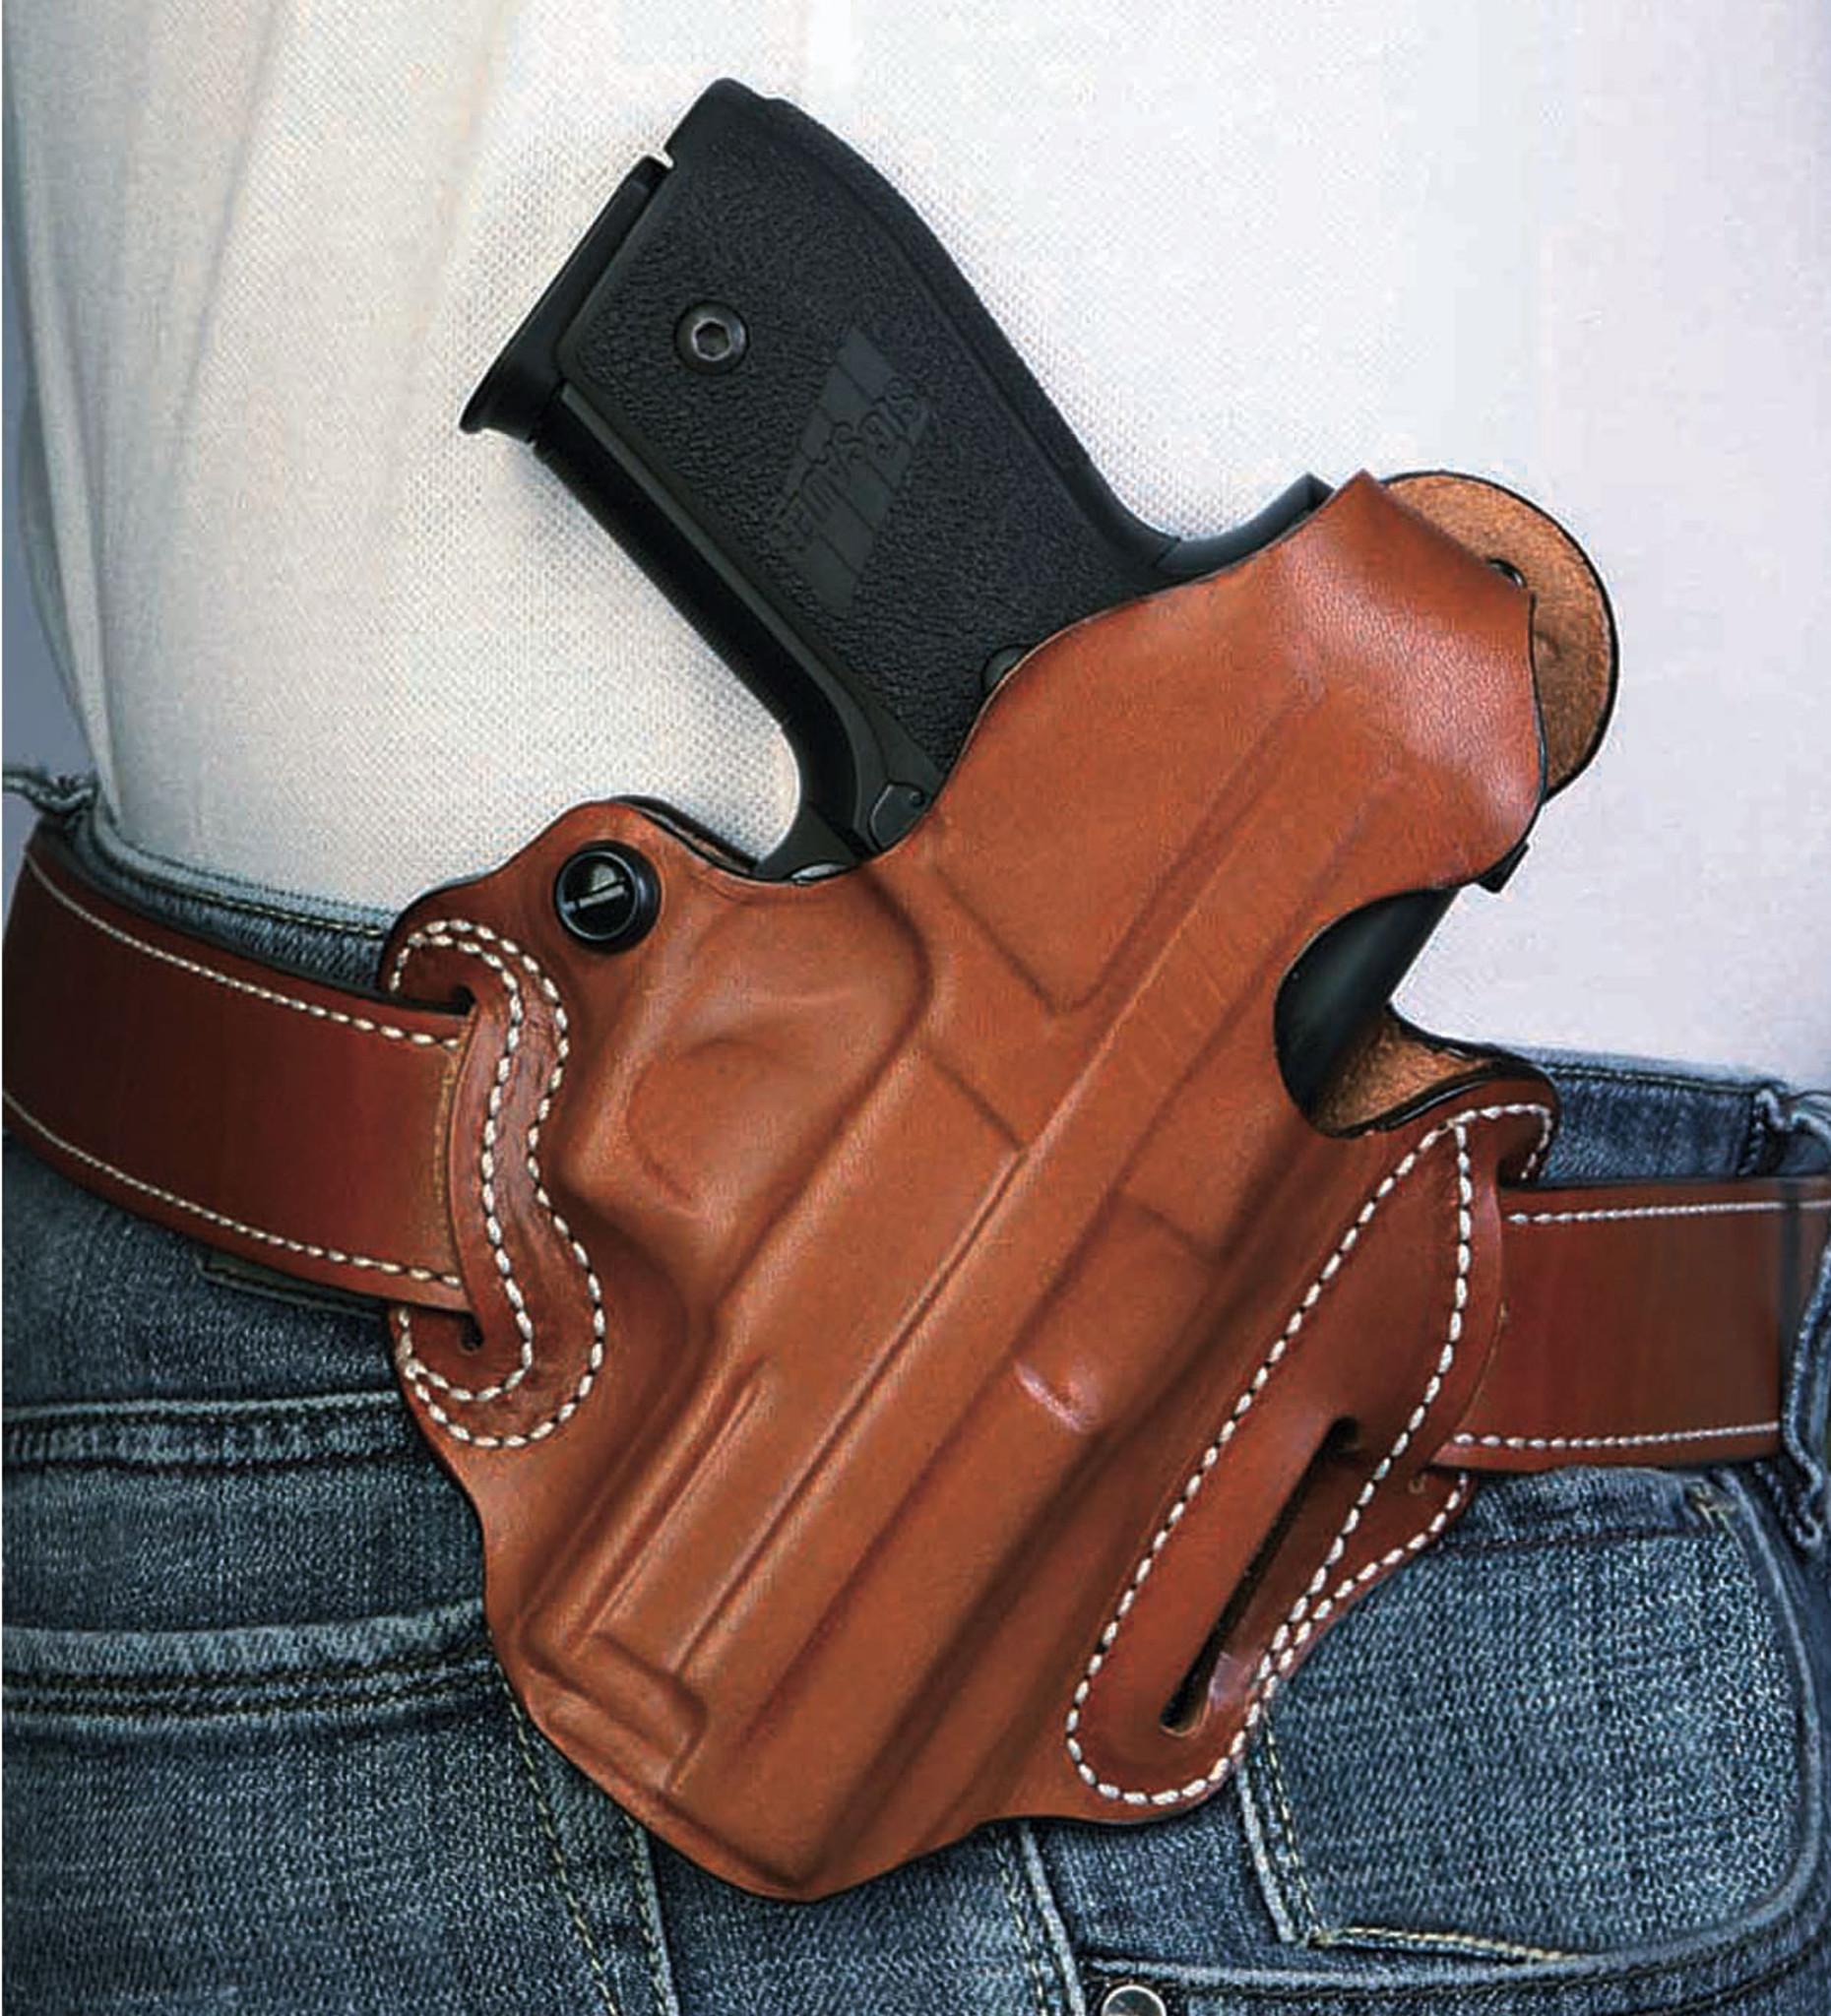 21 ON DUTY Gun Holster Glock 20 21SF Thumb Break RH OWB Black Leather